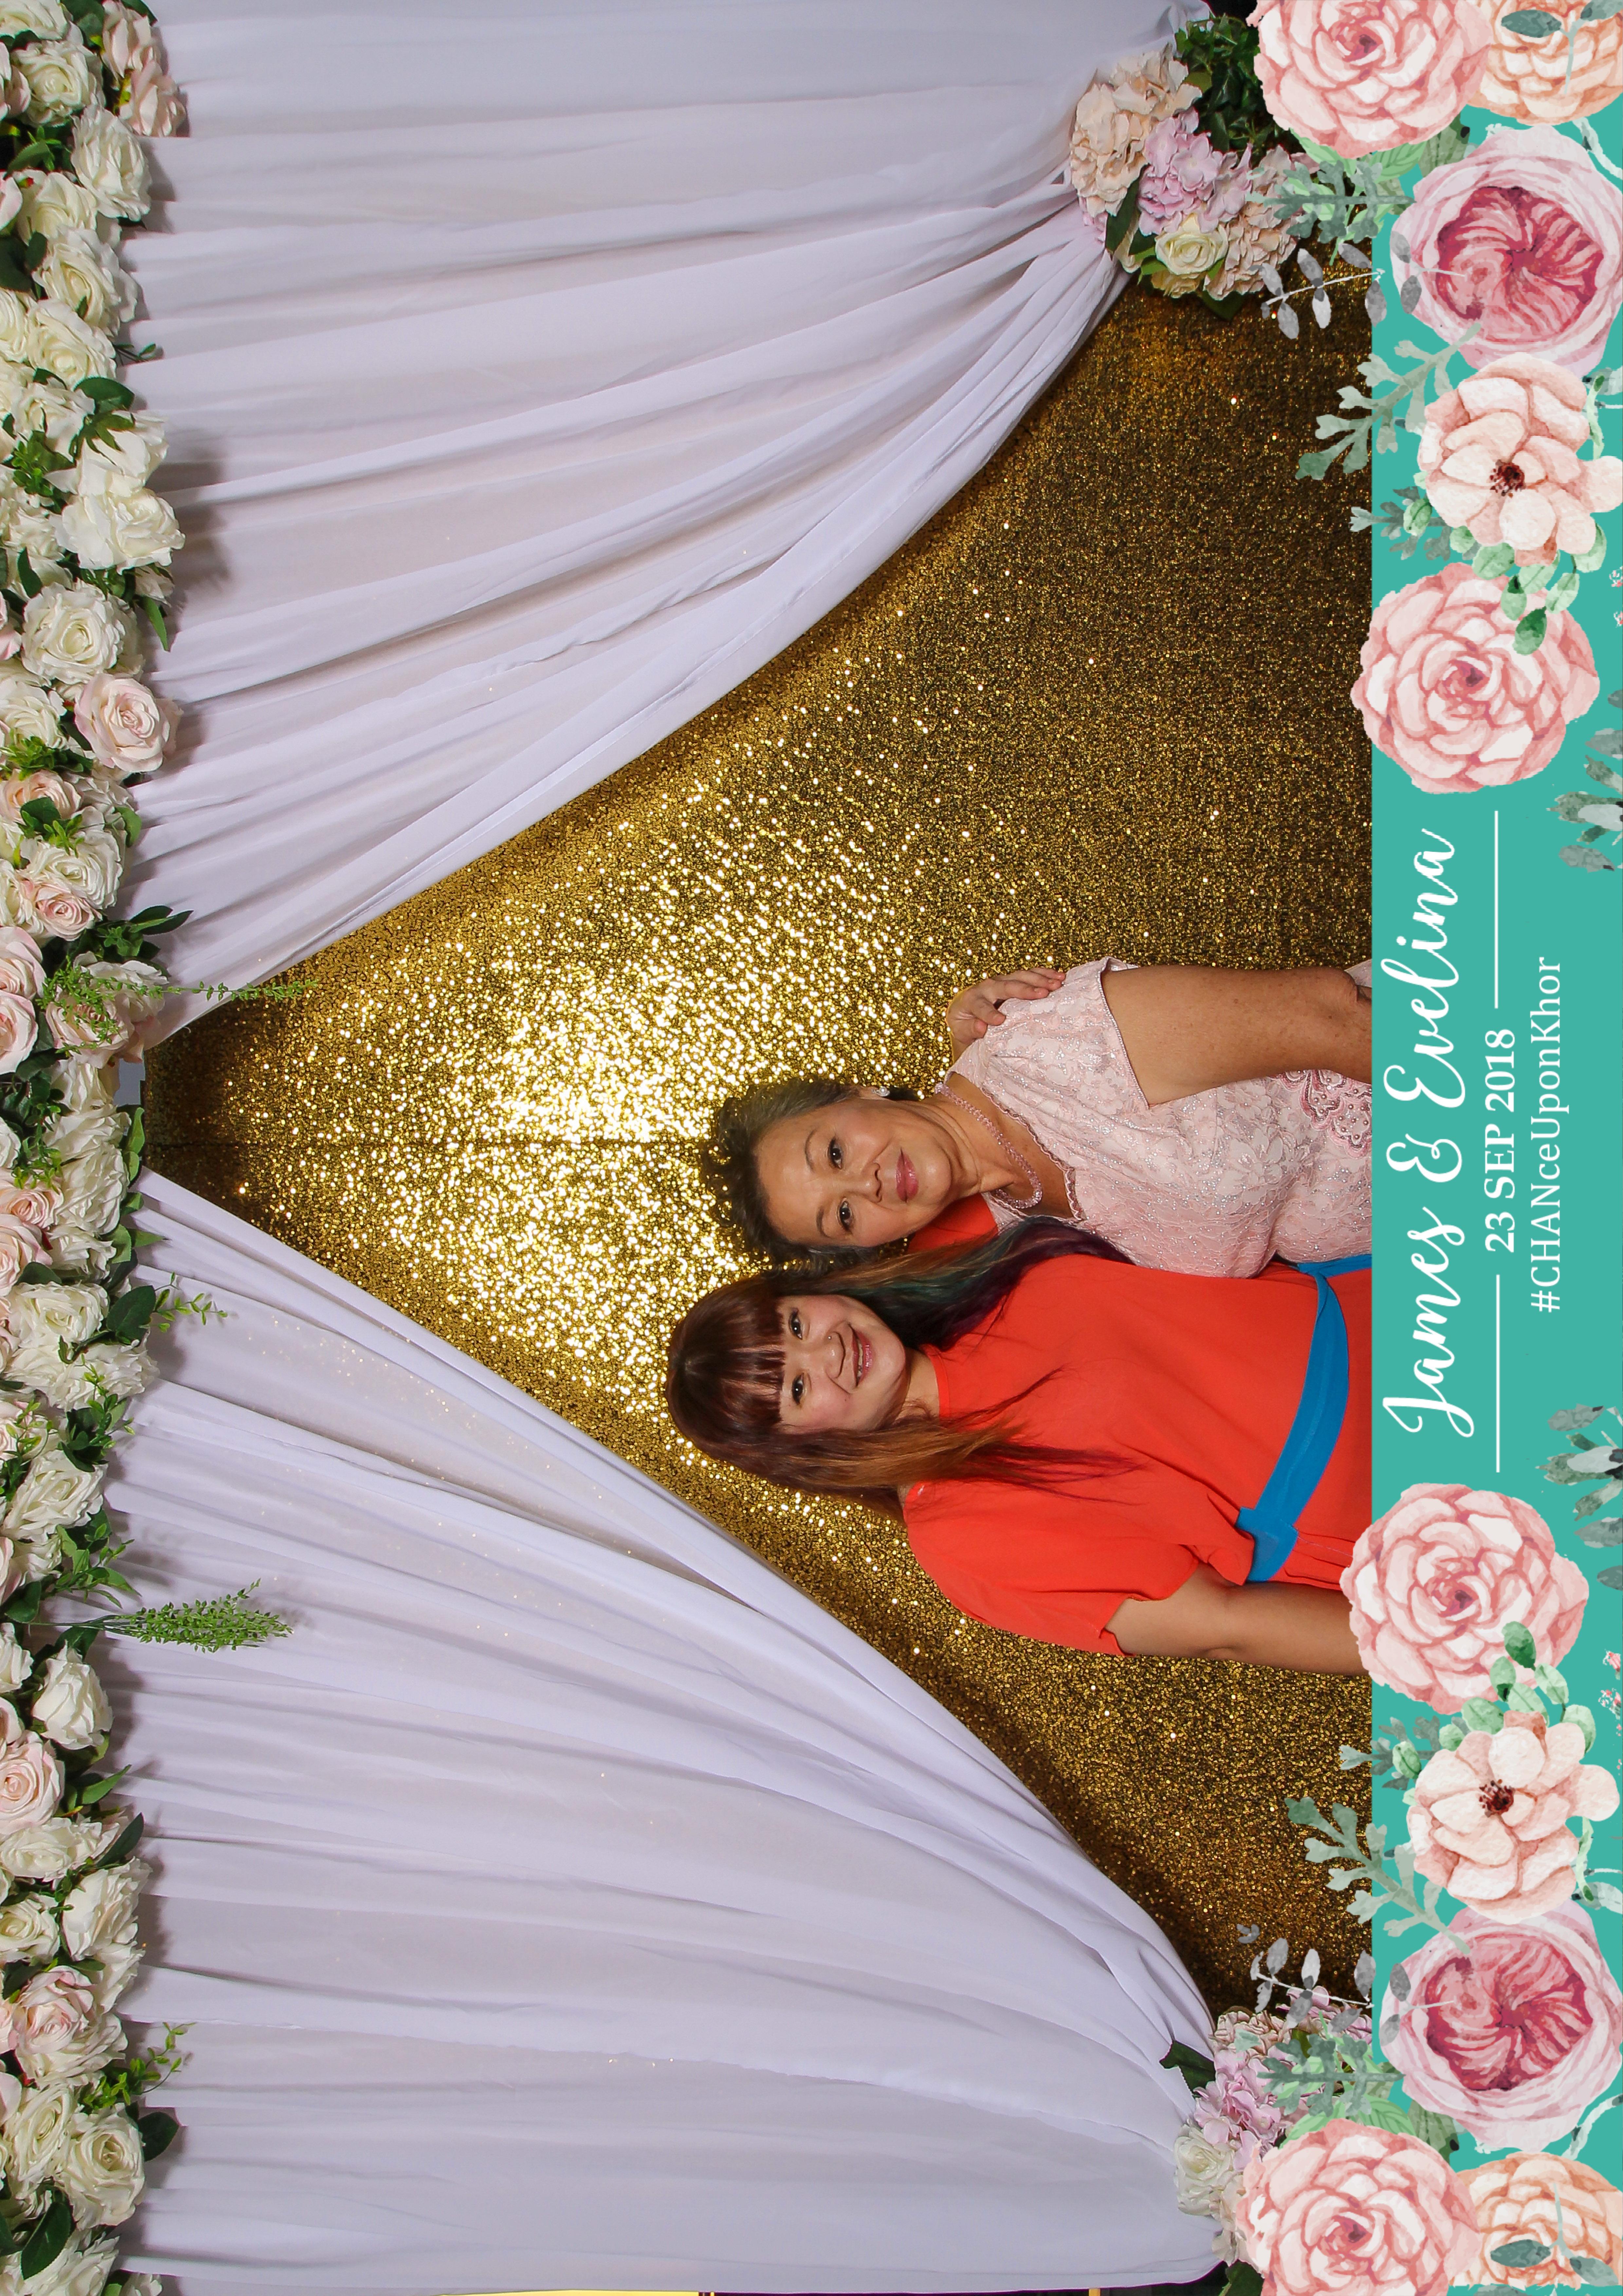 wedding photo booth singapore-10